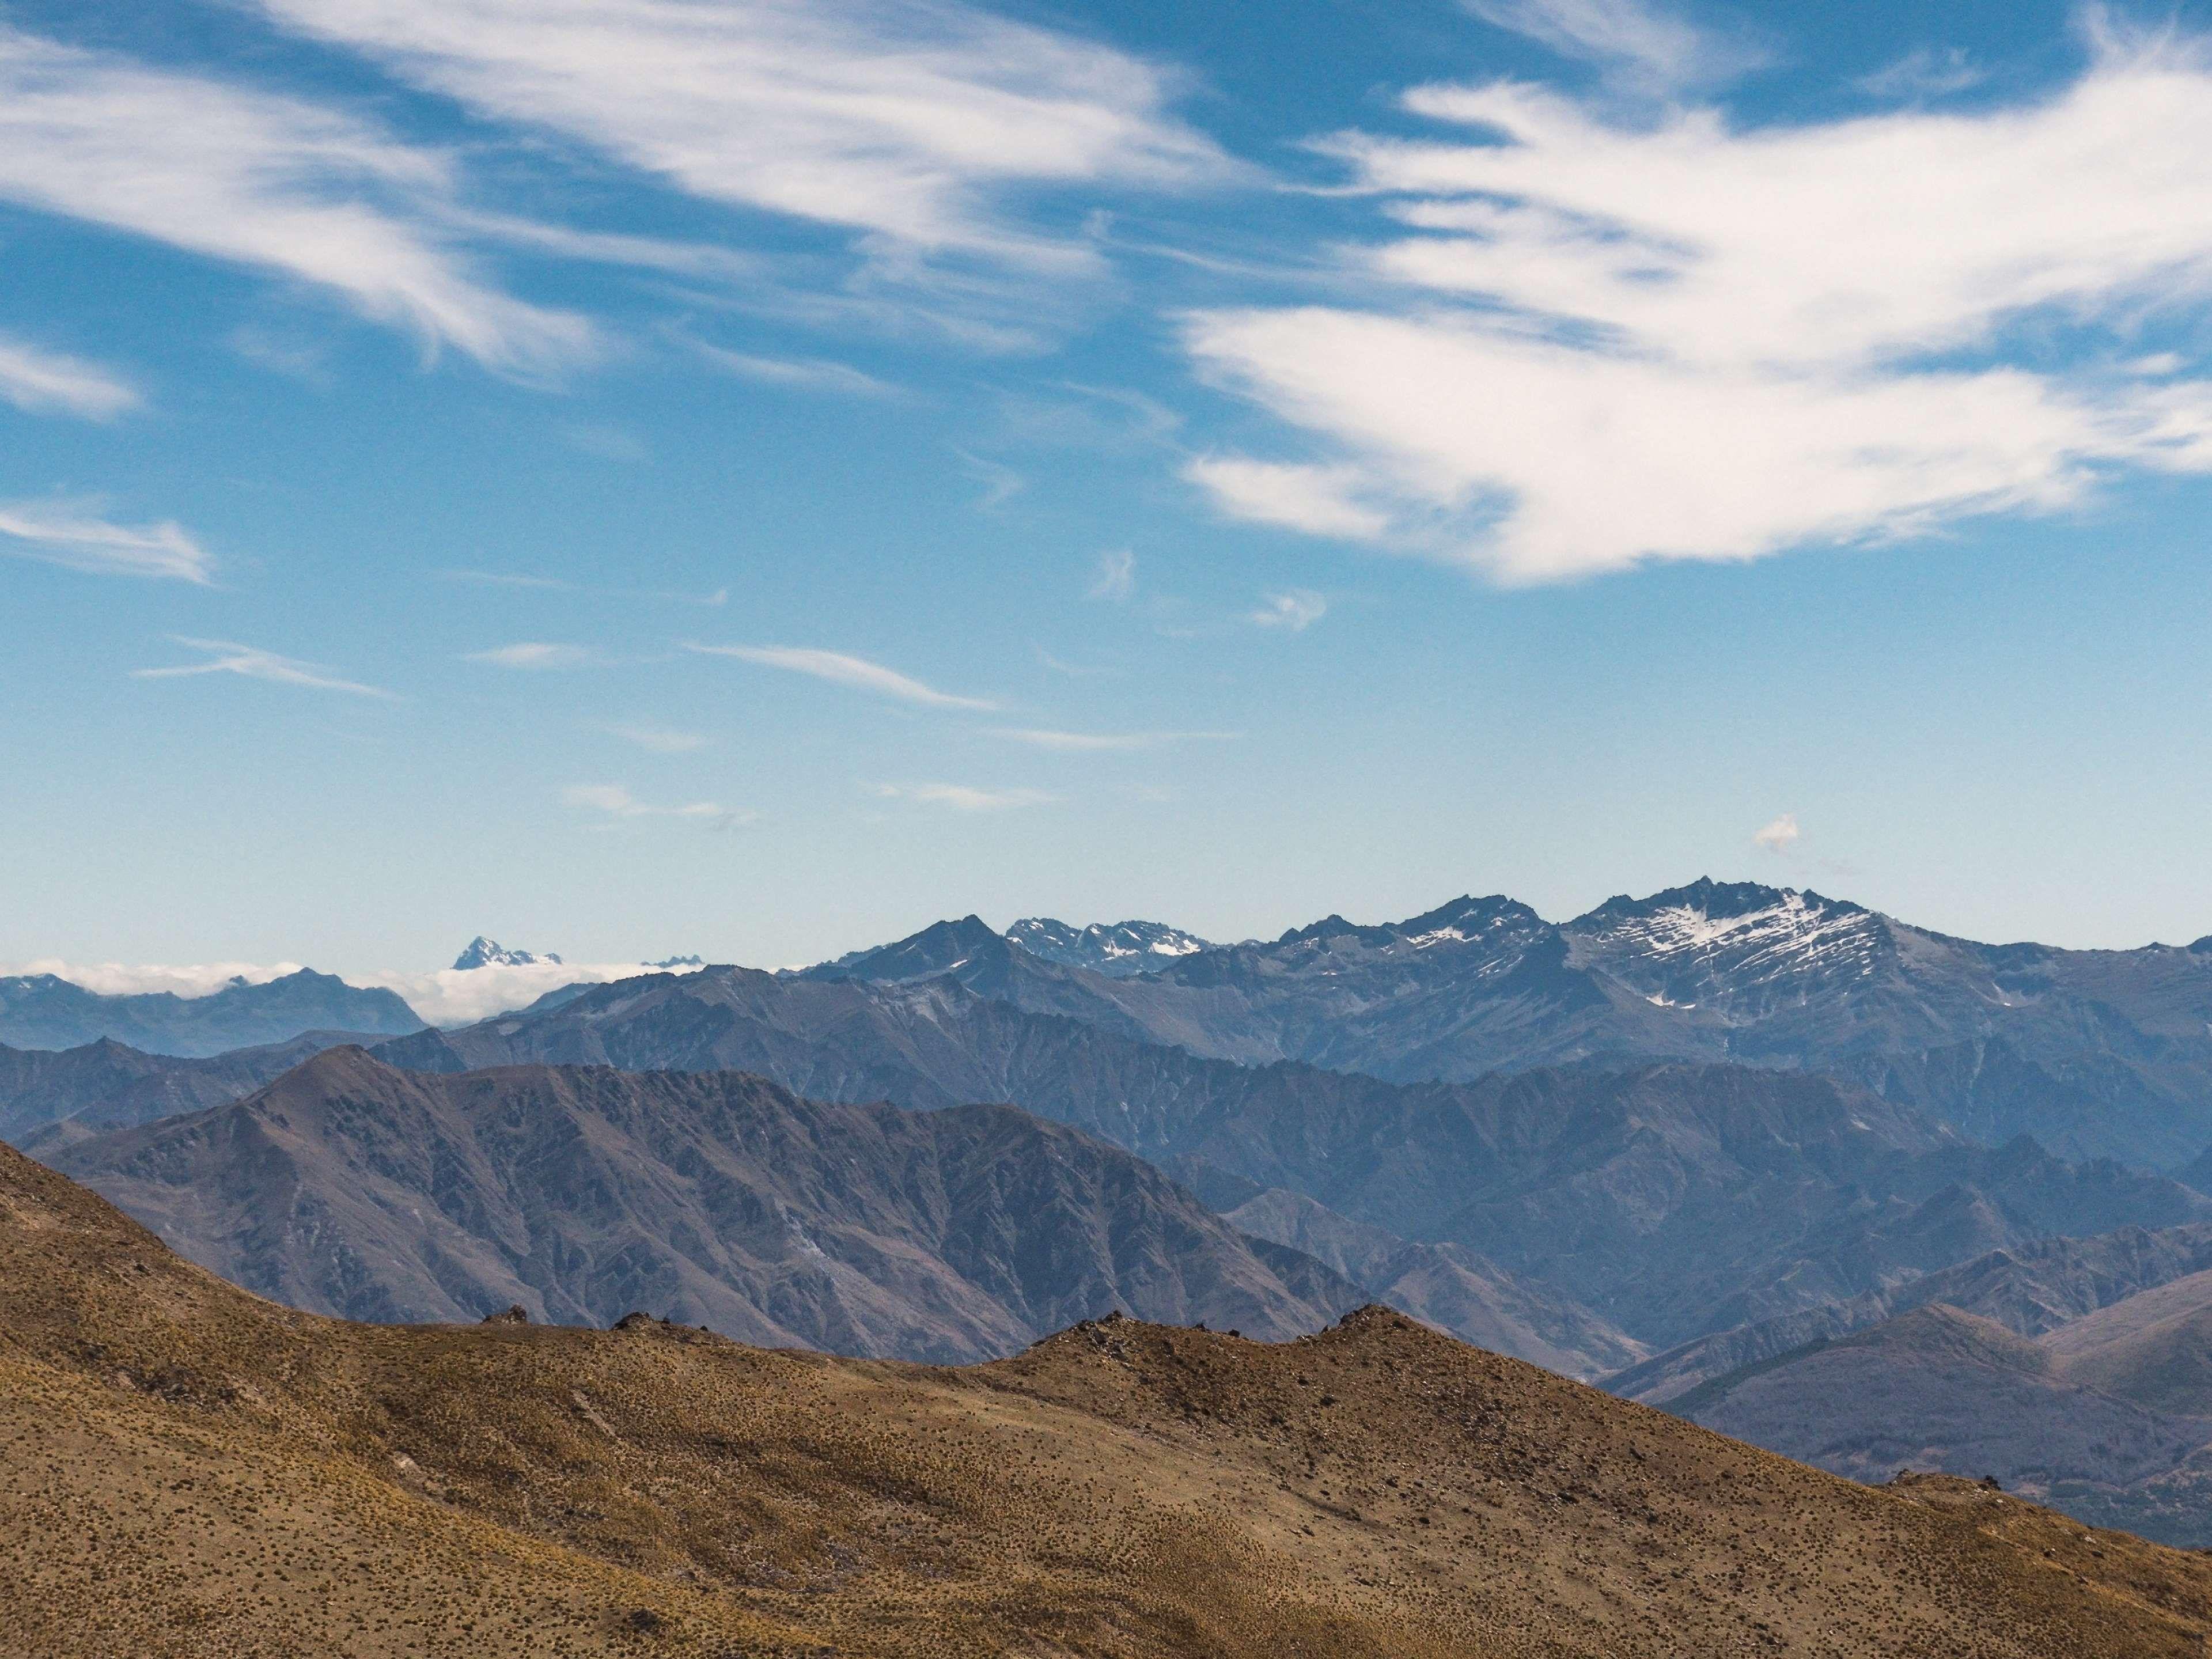 adventure blue sky clouds distance fade hills mountain range